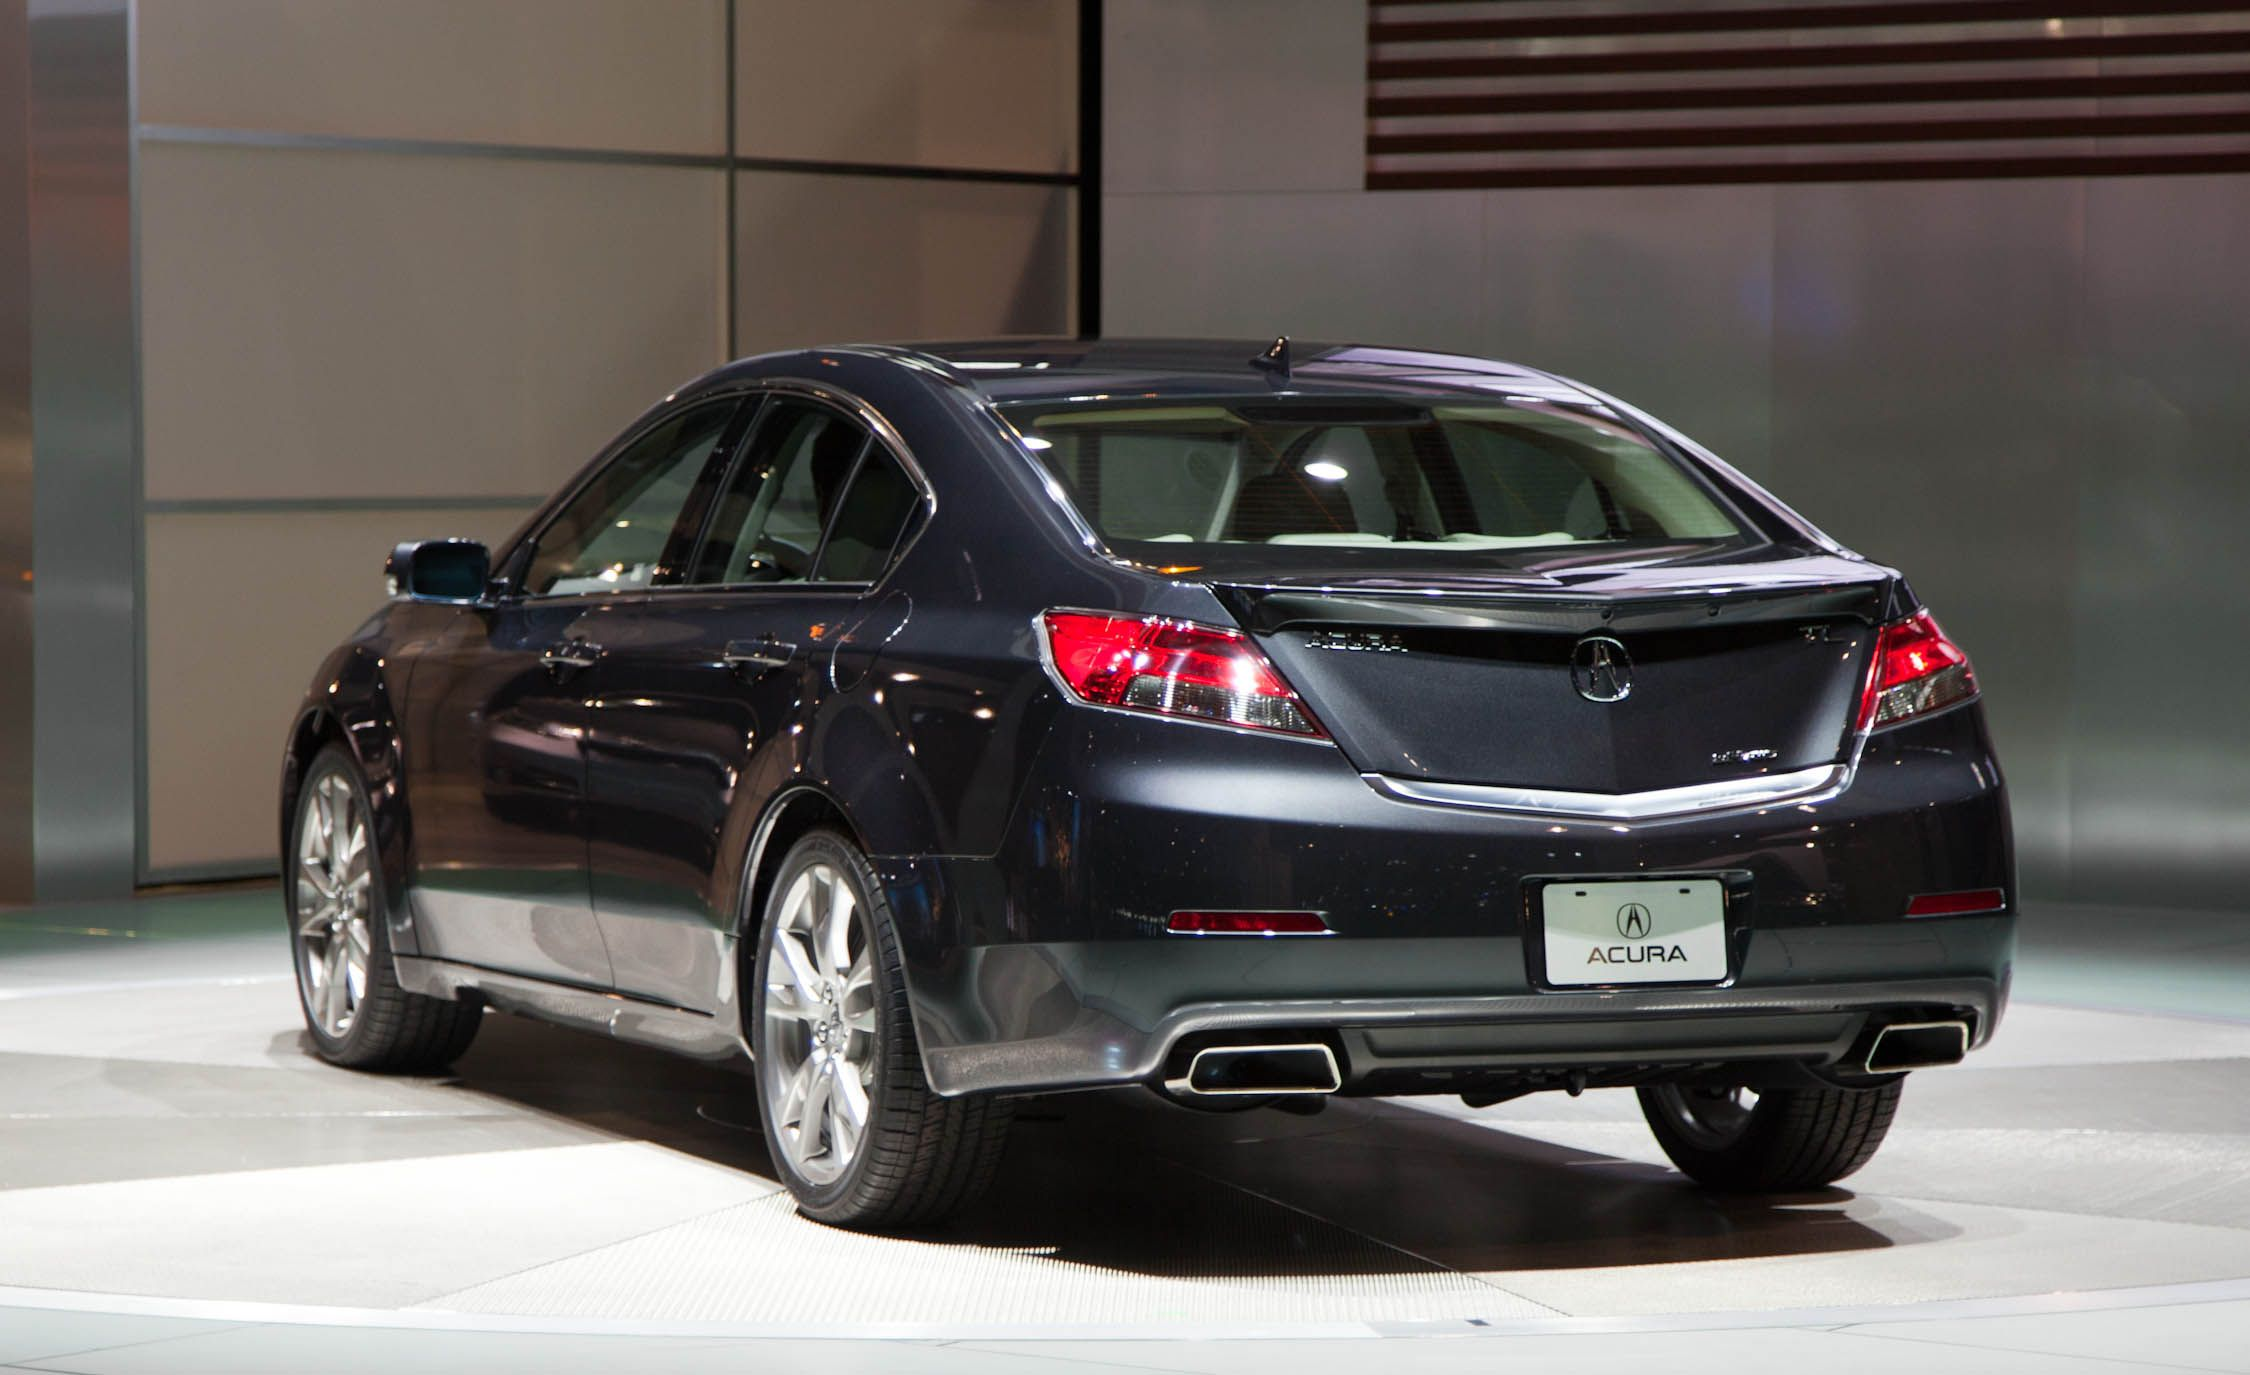 2012 Acura Tl Photos And Info Acura Tl News 150 Car And Driver